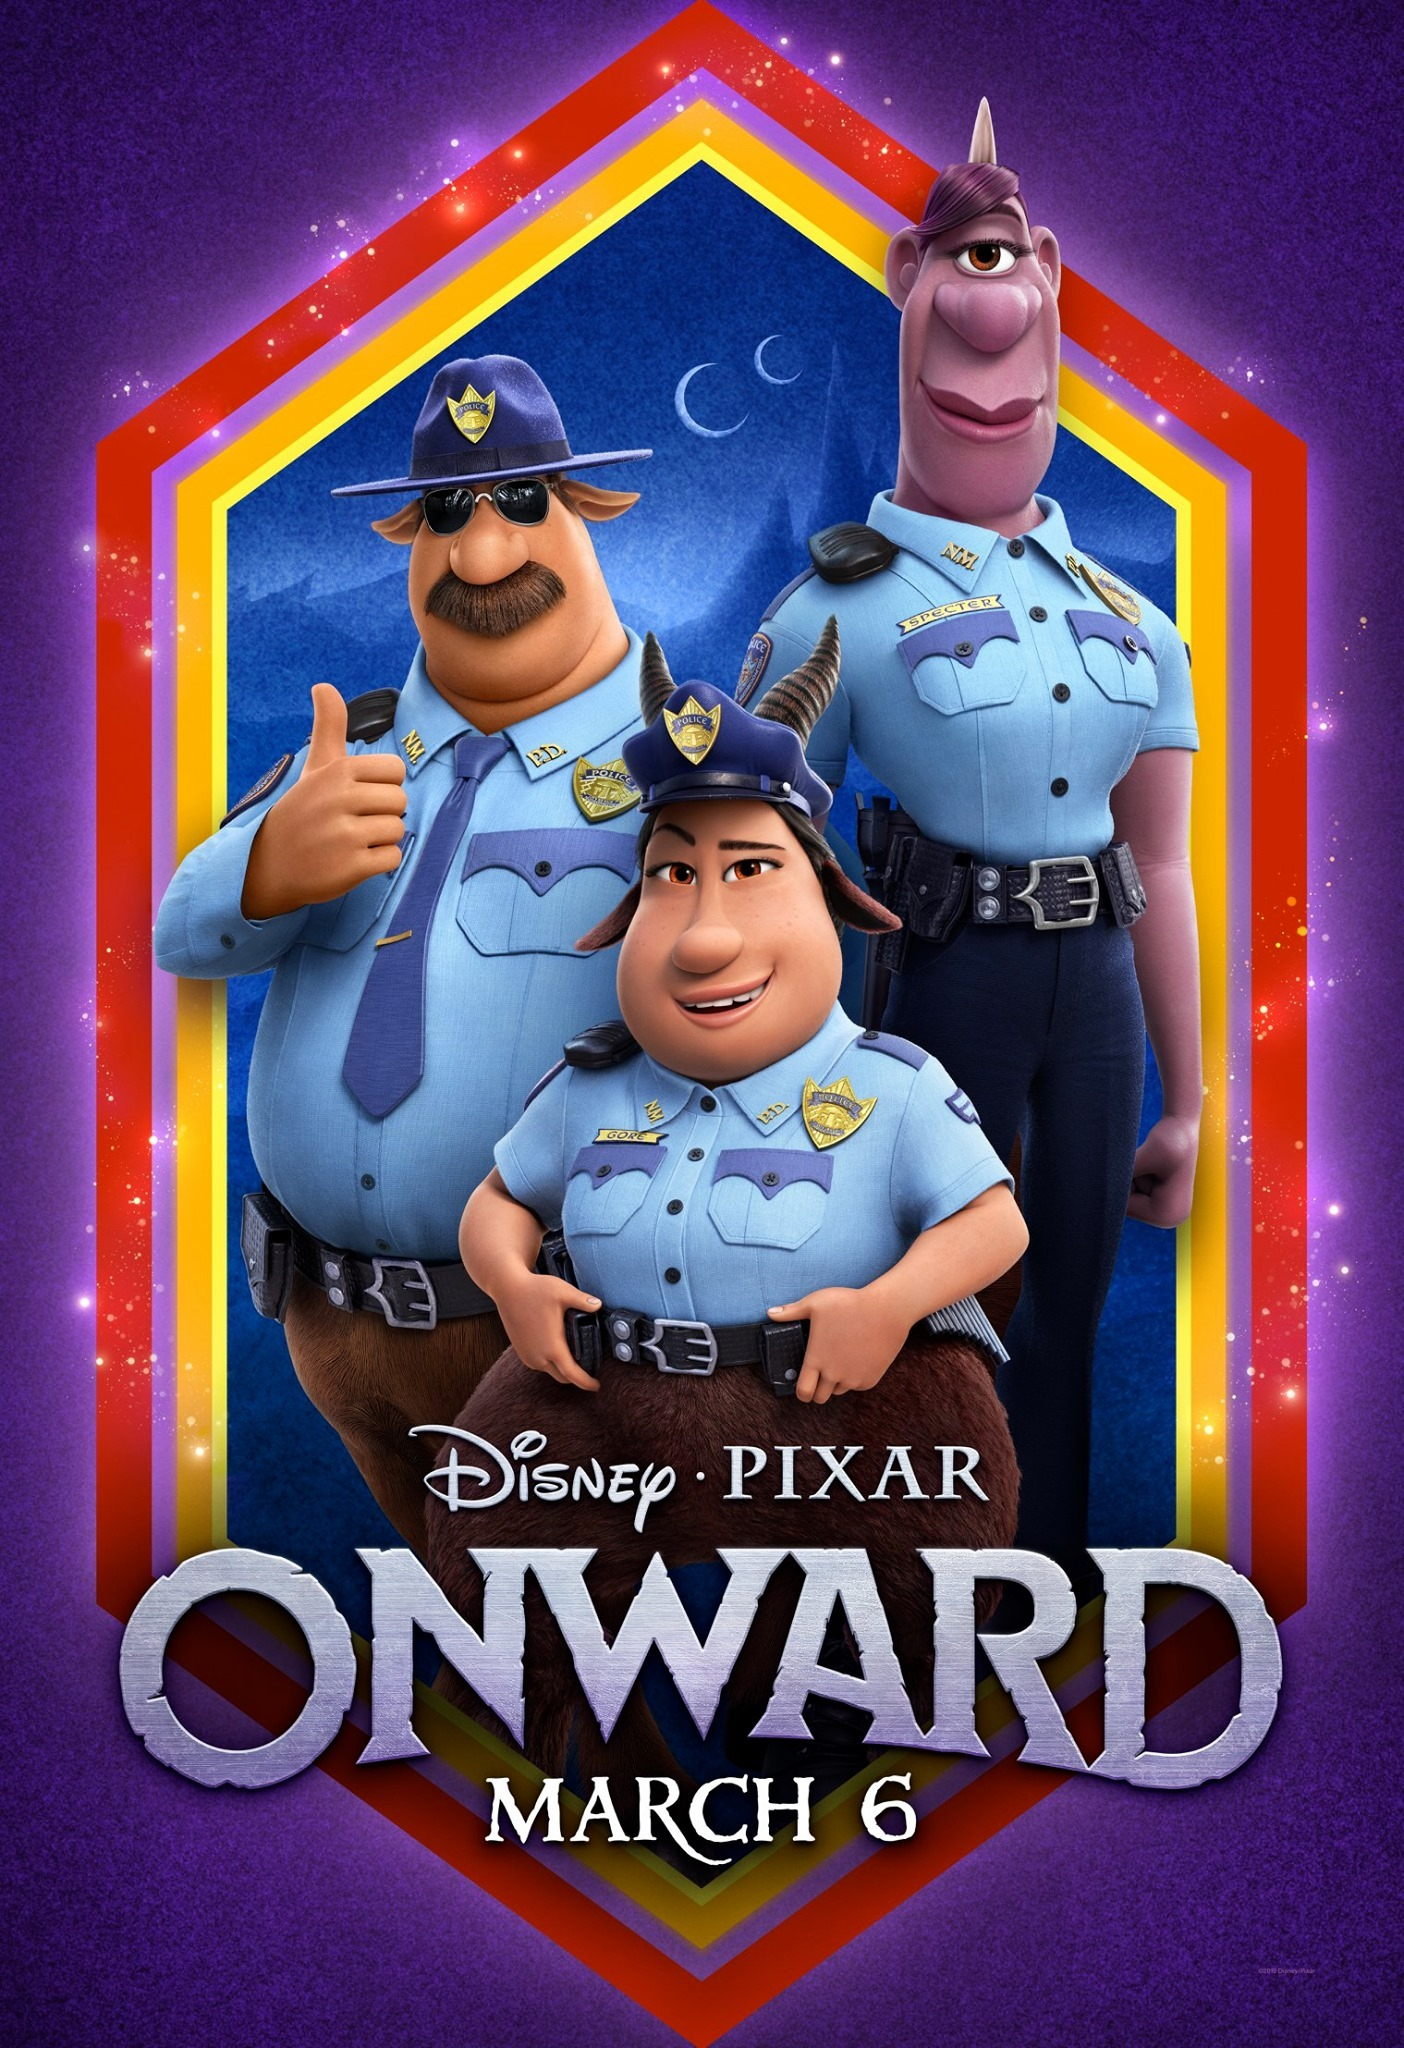 szmk_onward_elore_pixar_disney_animaacos_film_6.jpg